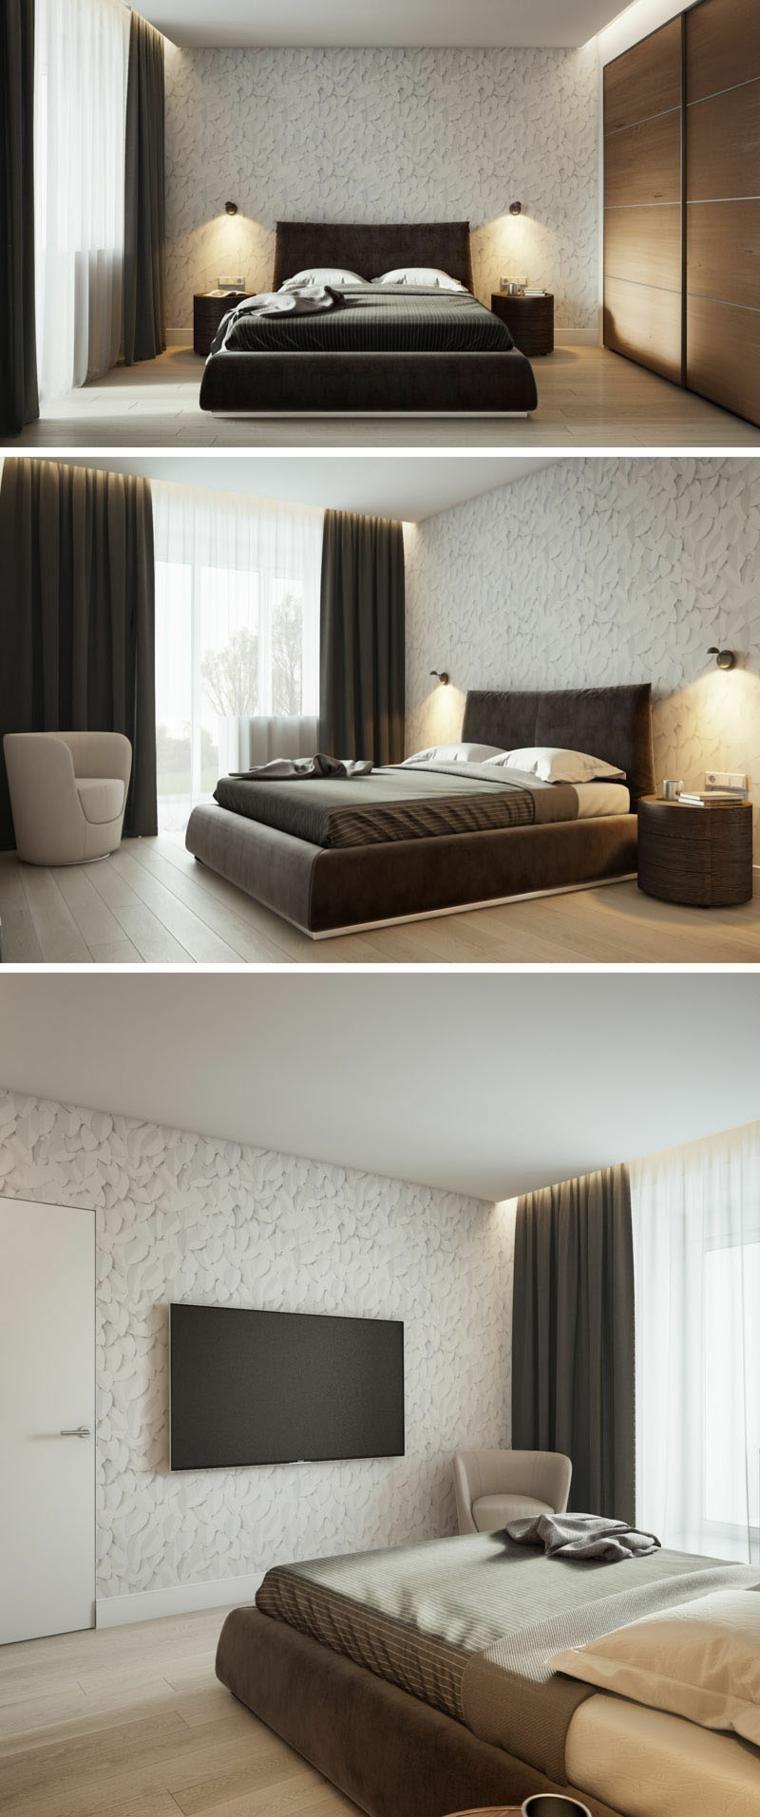 Interior Design Haus 2018 Modernes Apartment in Moskau, von Buro 108 ...